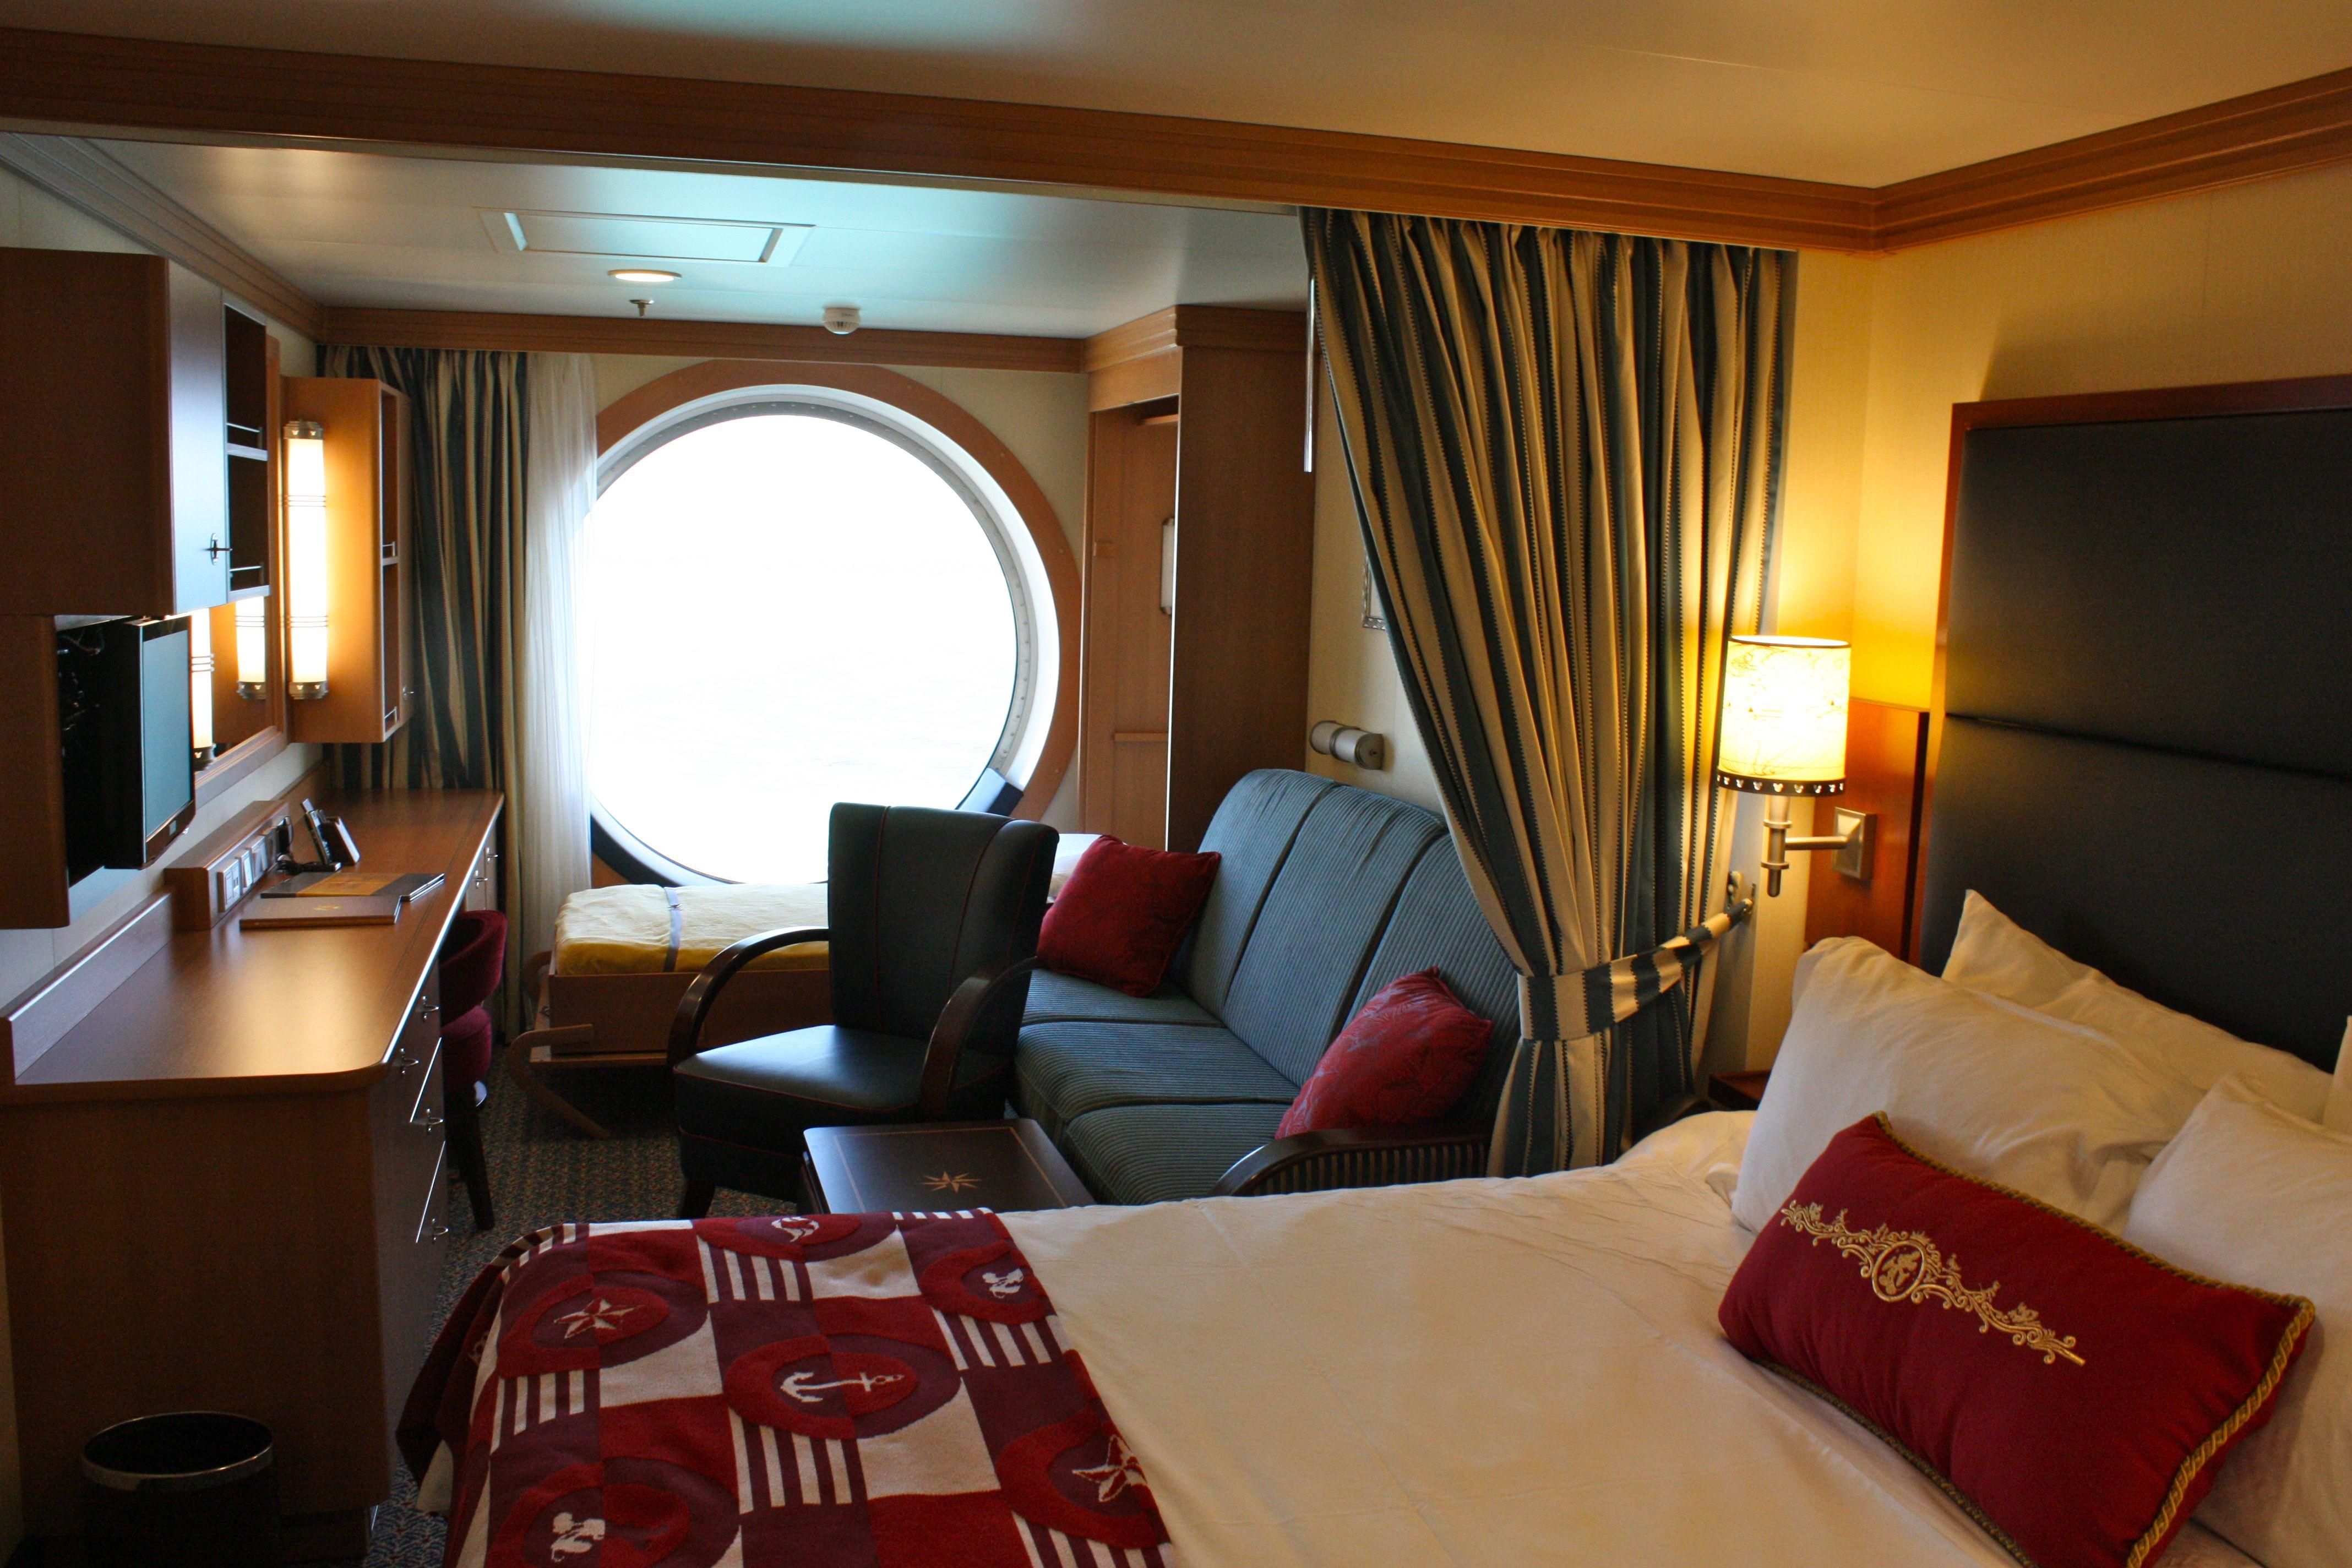 disney dream sofa bed dfs lime green leather cruise line  the magic part 6 disneyworldqueen